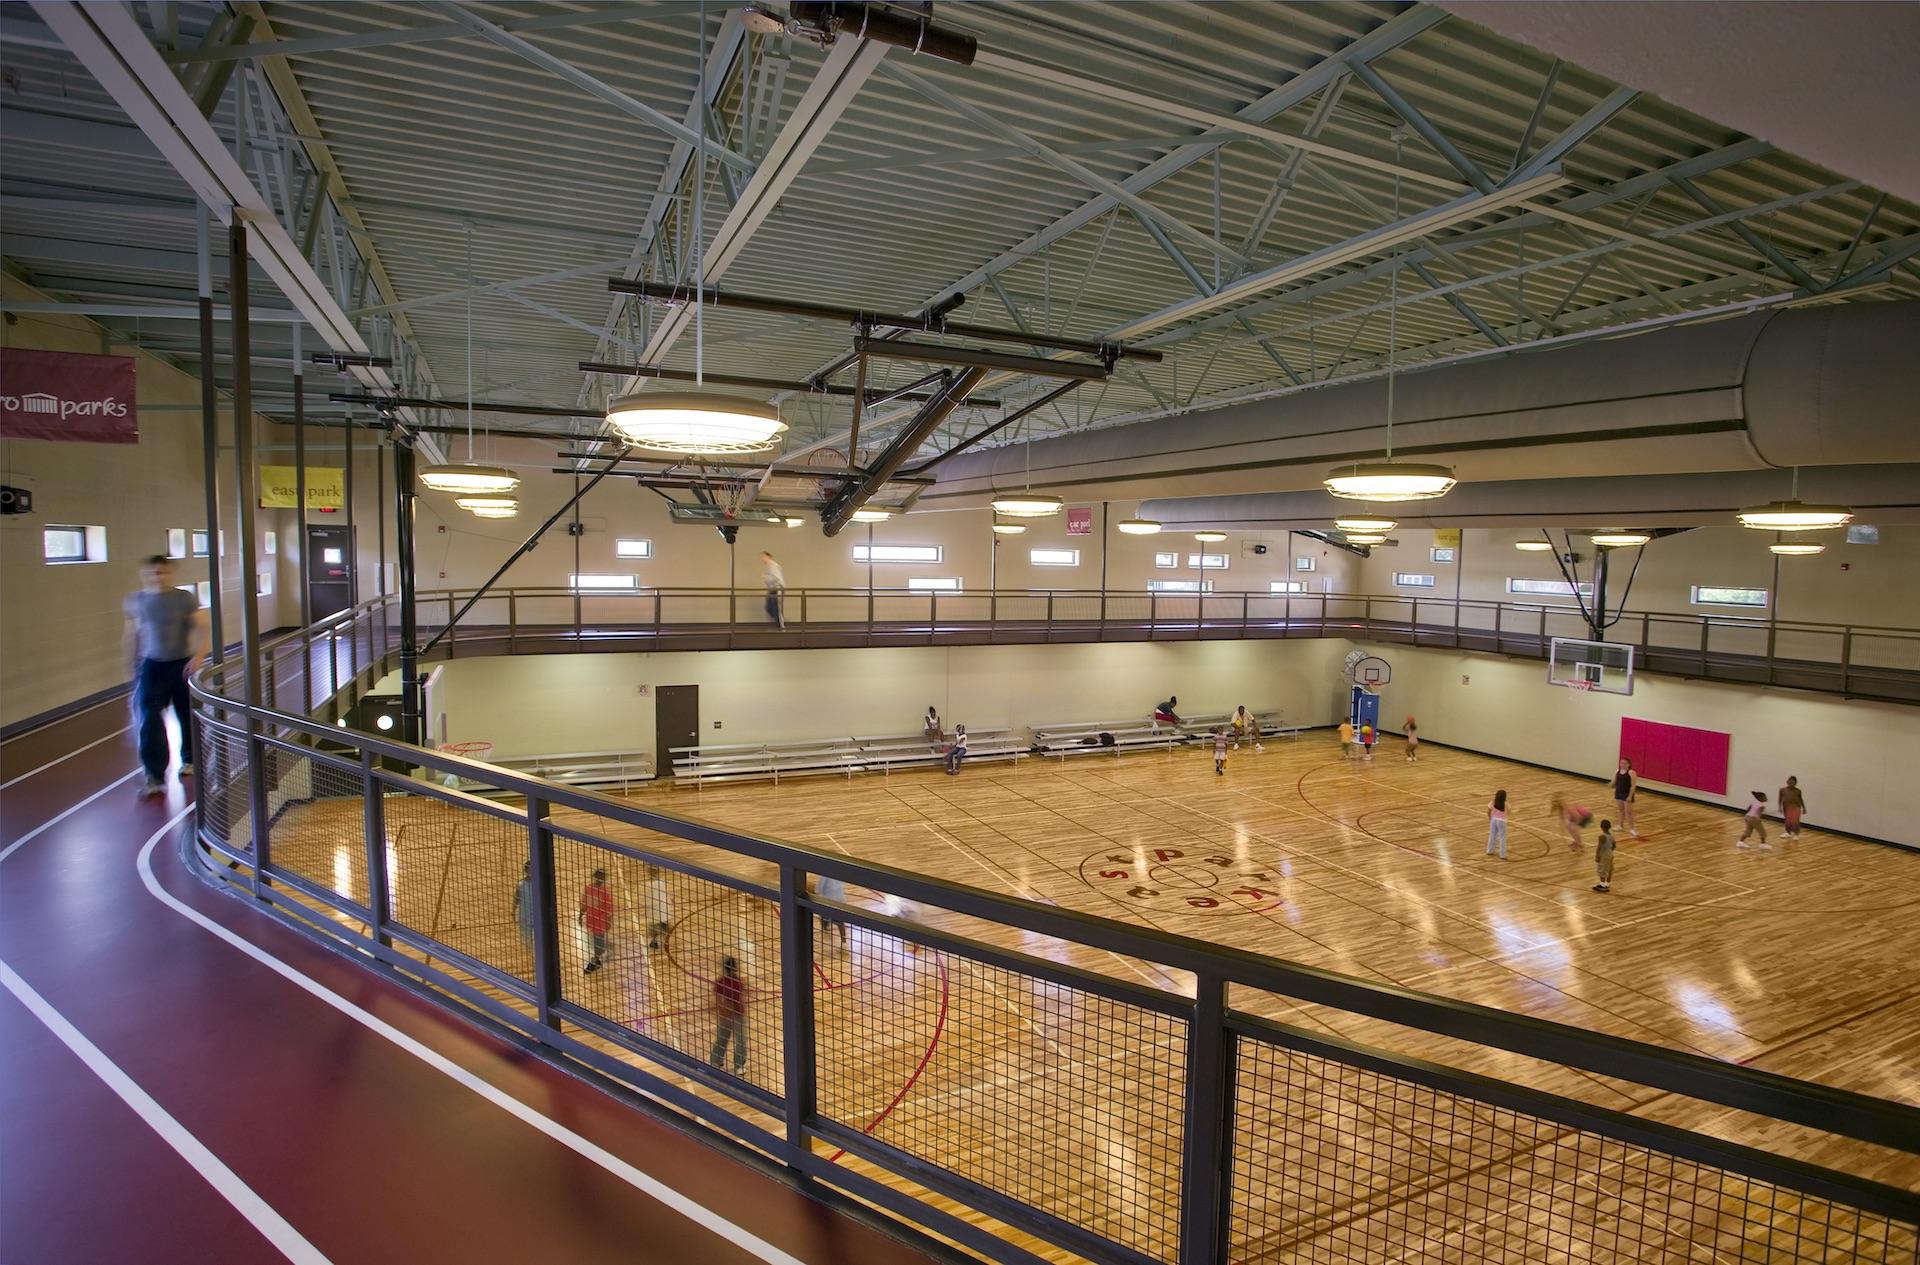 East Park Community Center